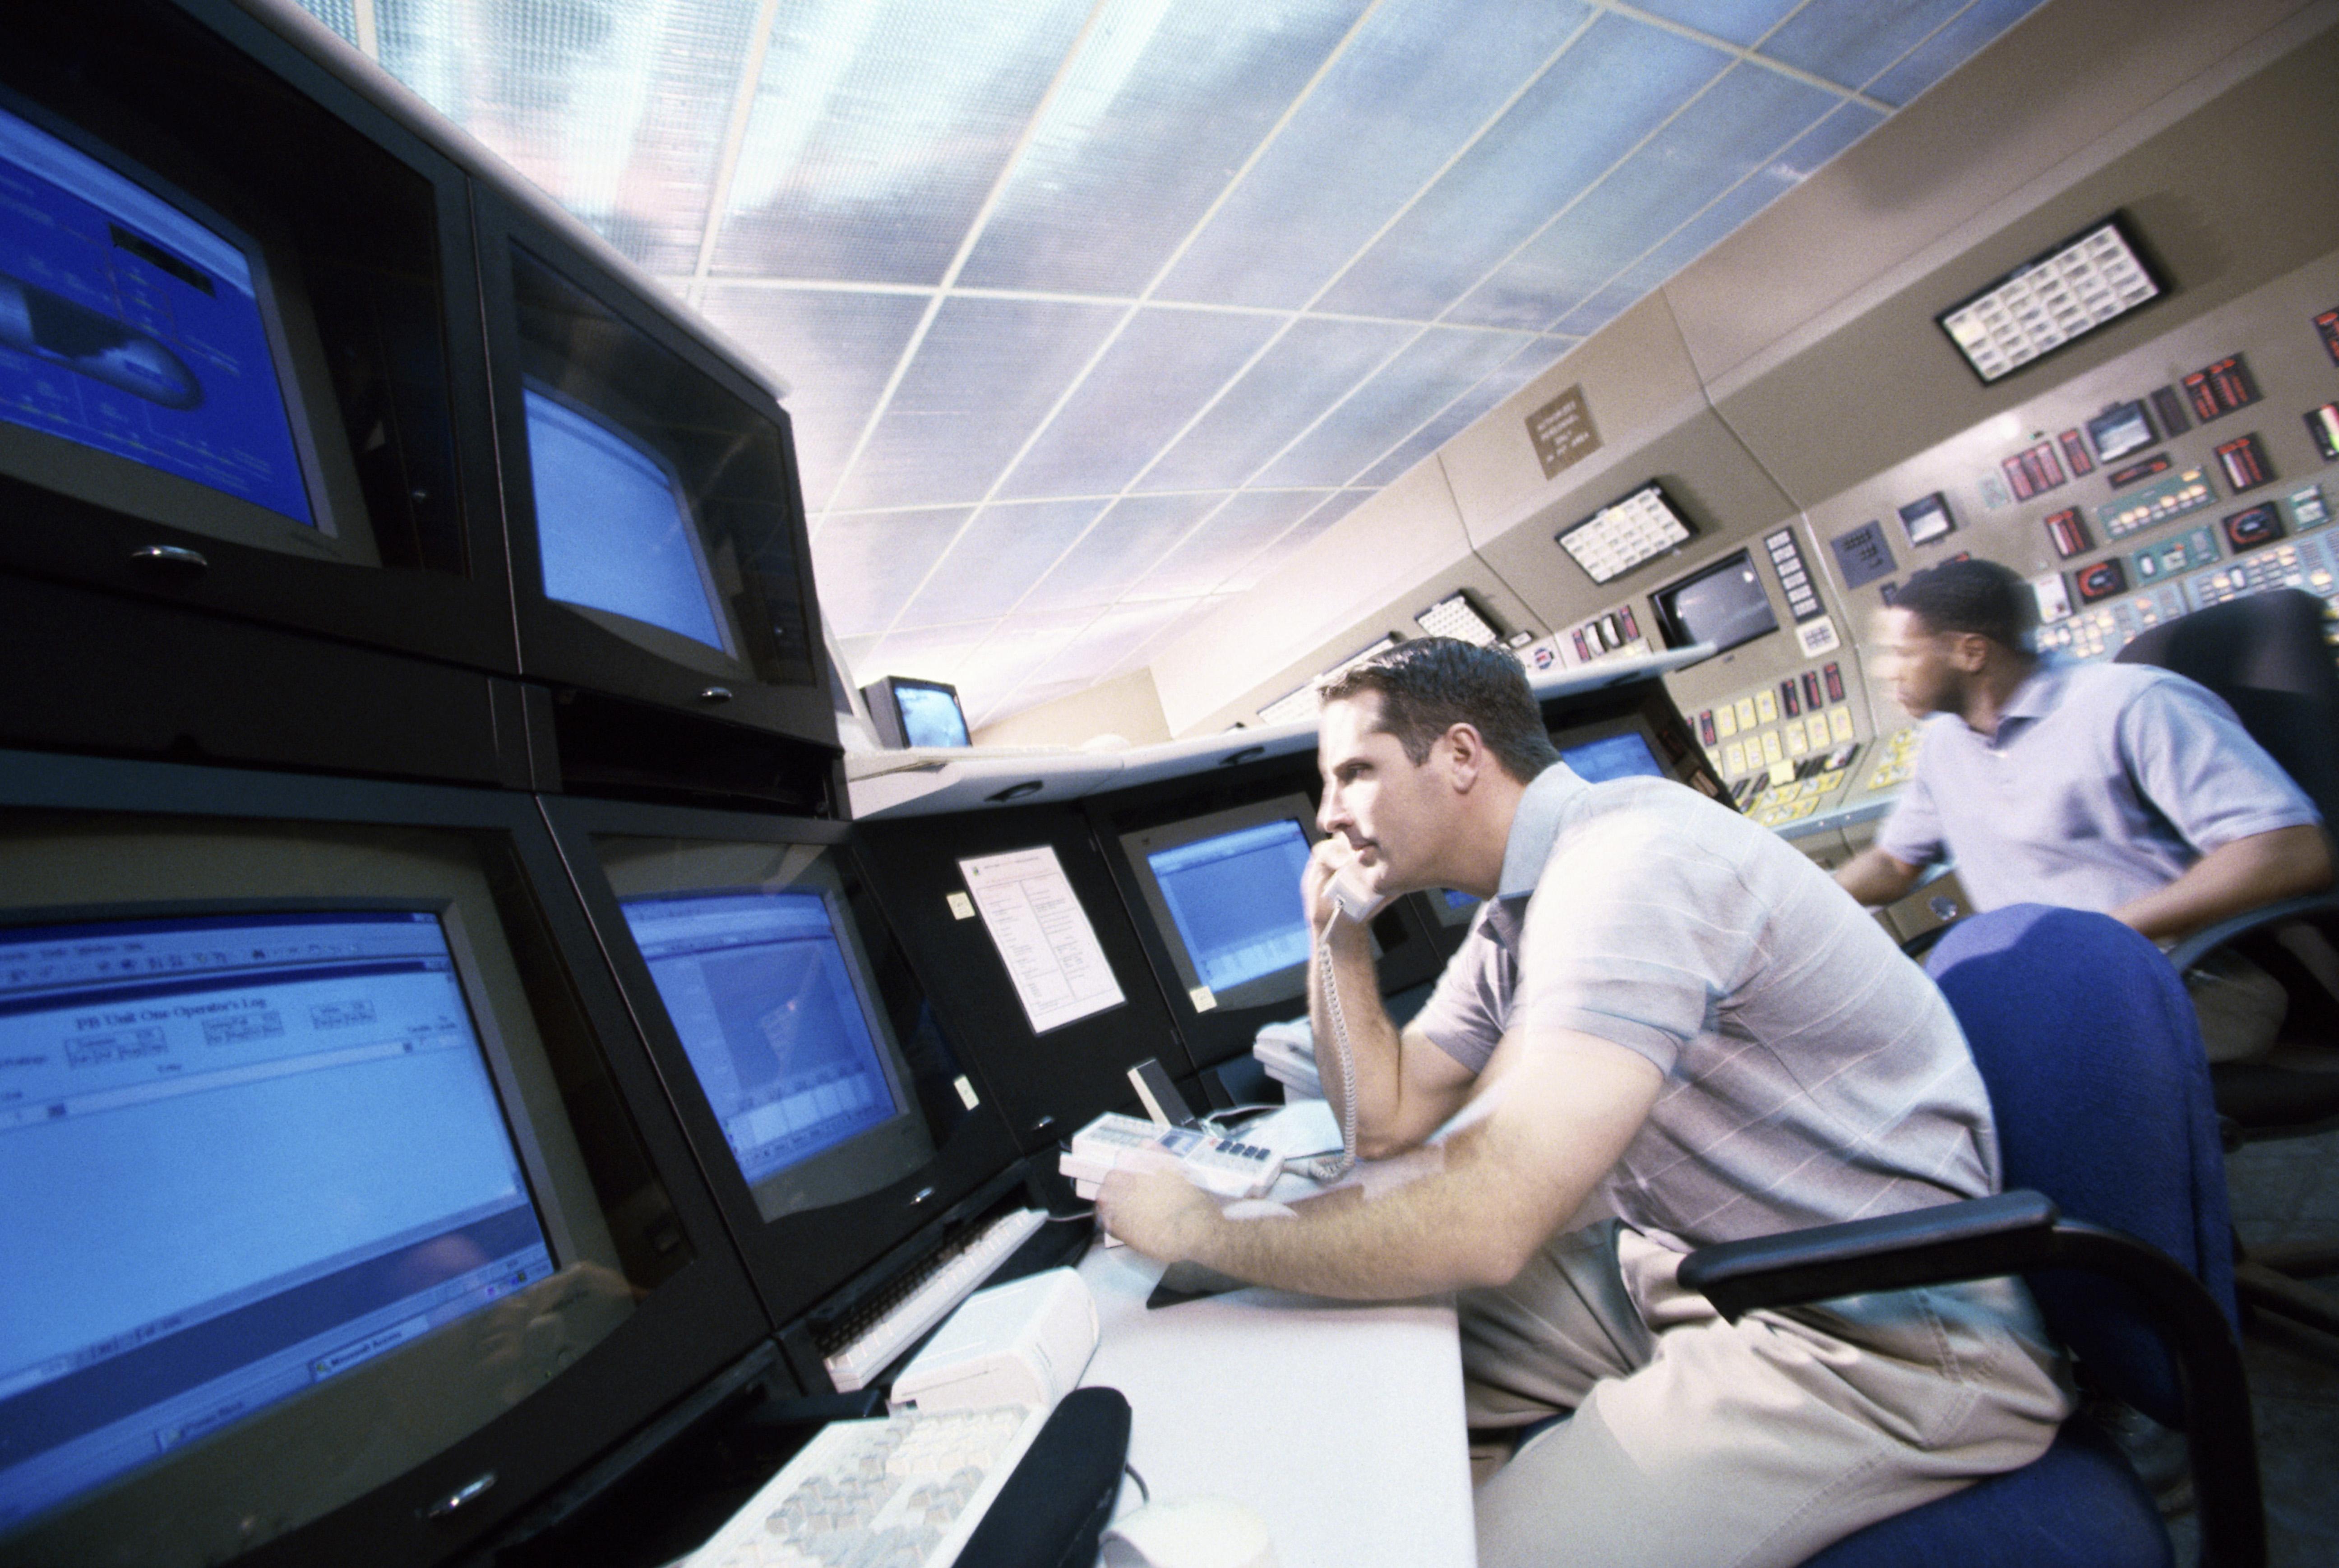 E-2 Unlimited Technologies